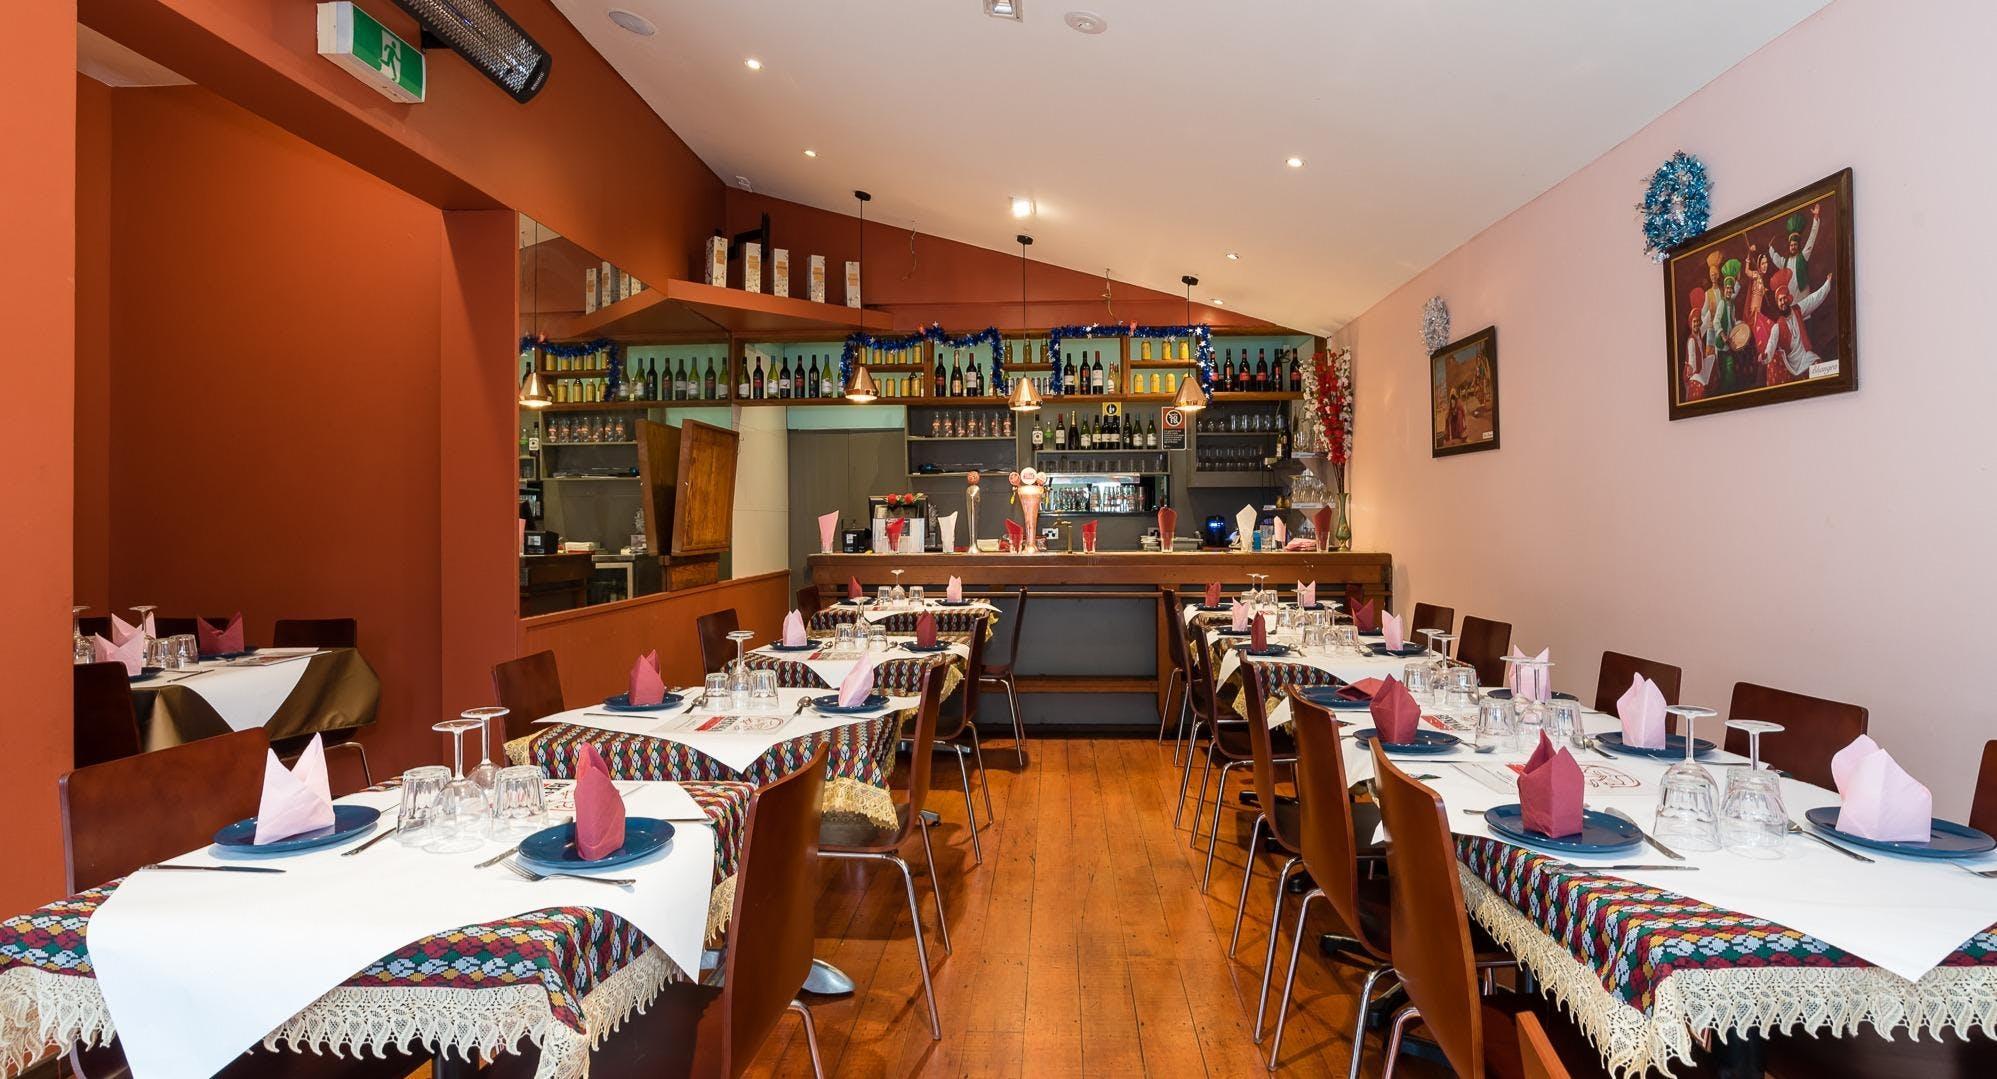 Resunga Indian Curry Restaurant & Bar